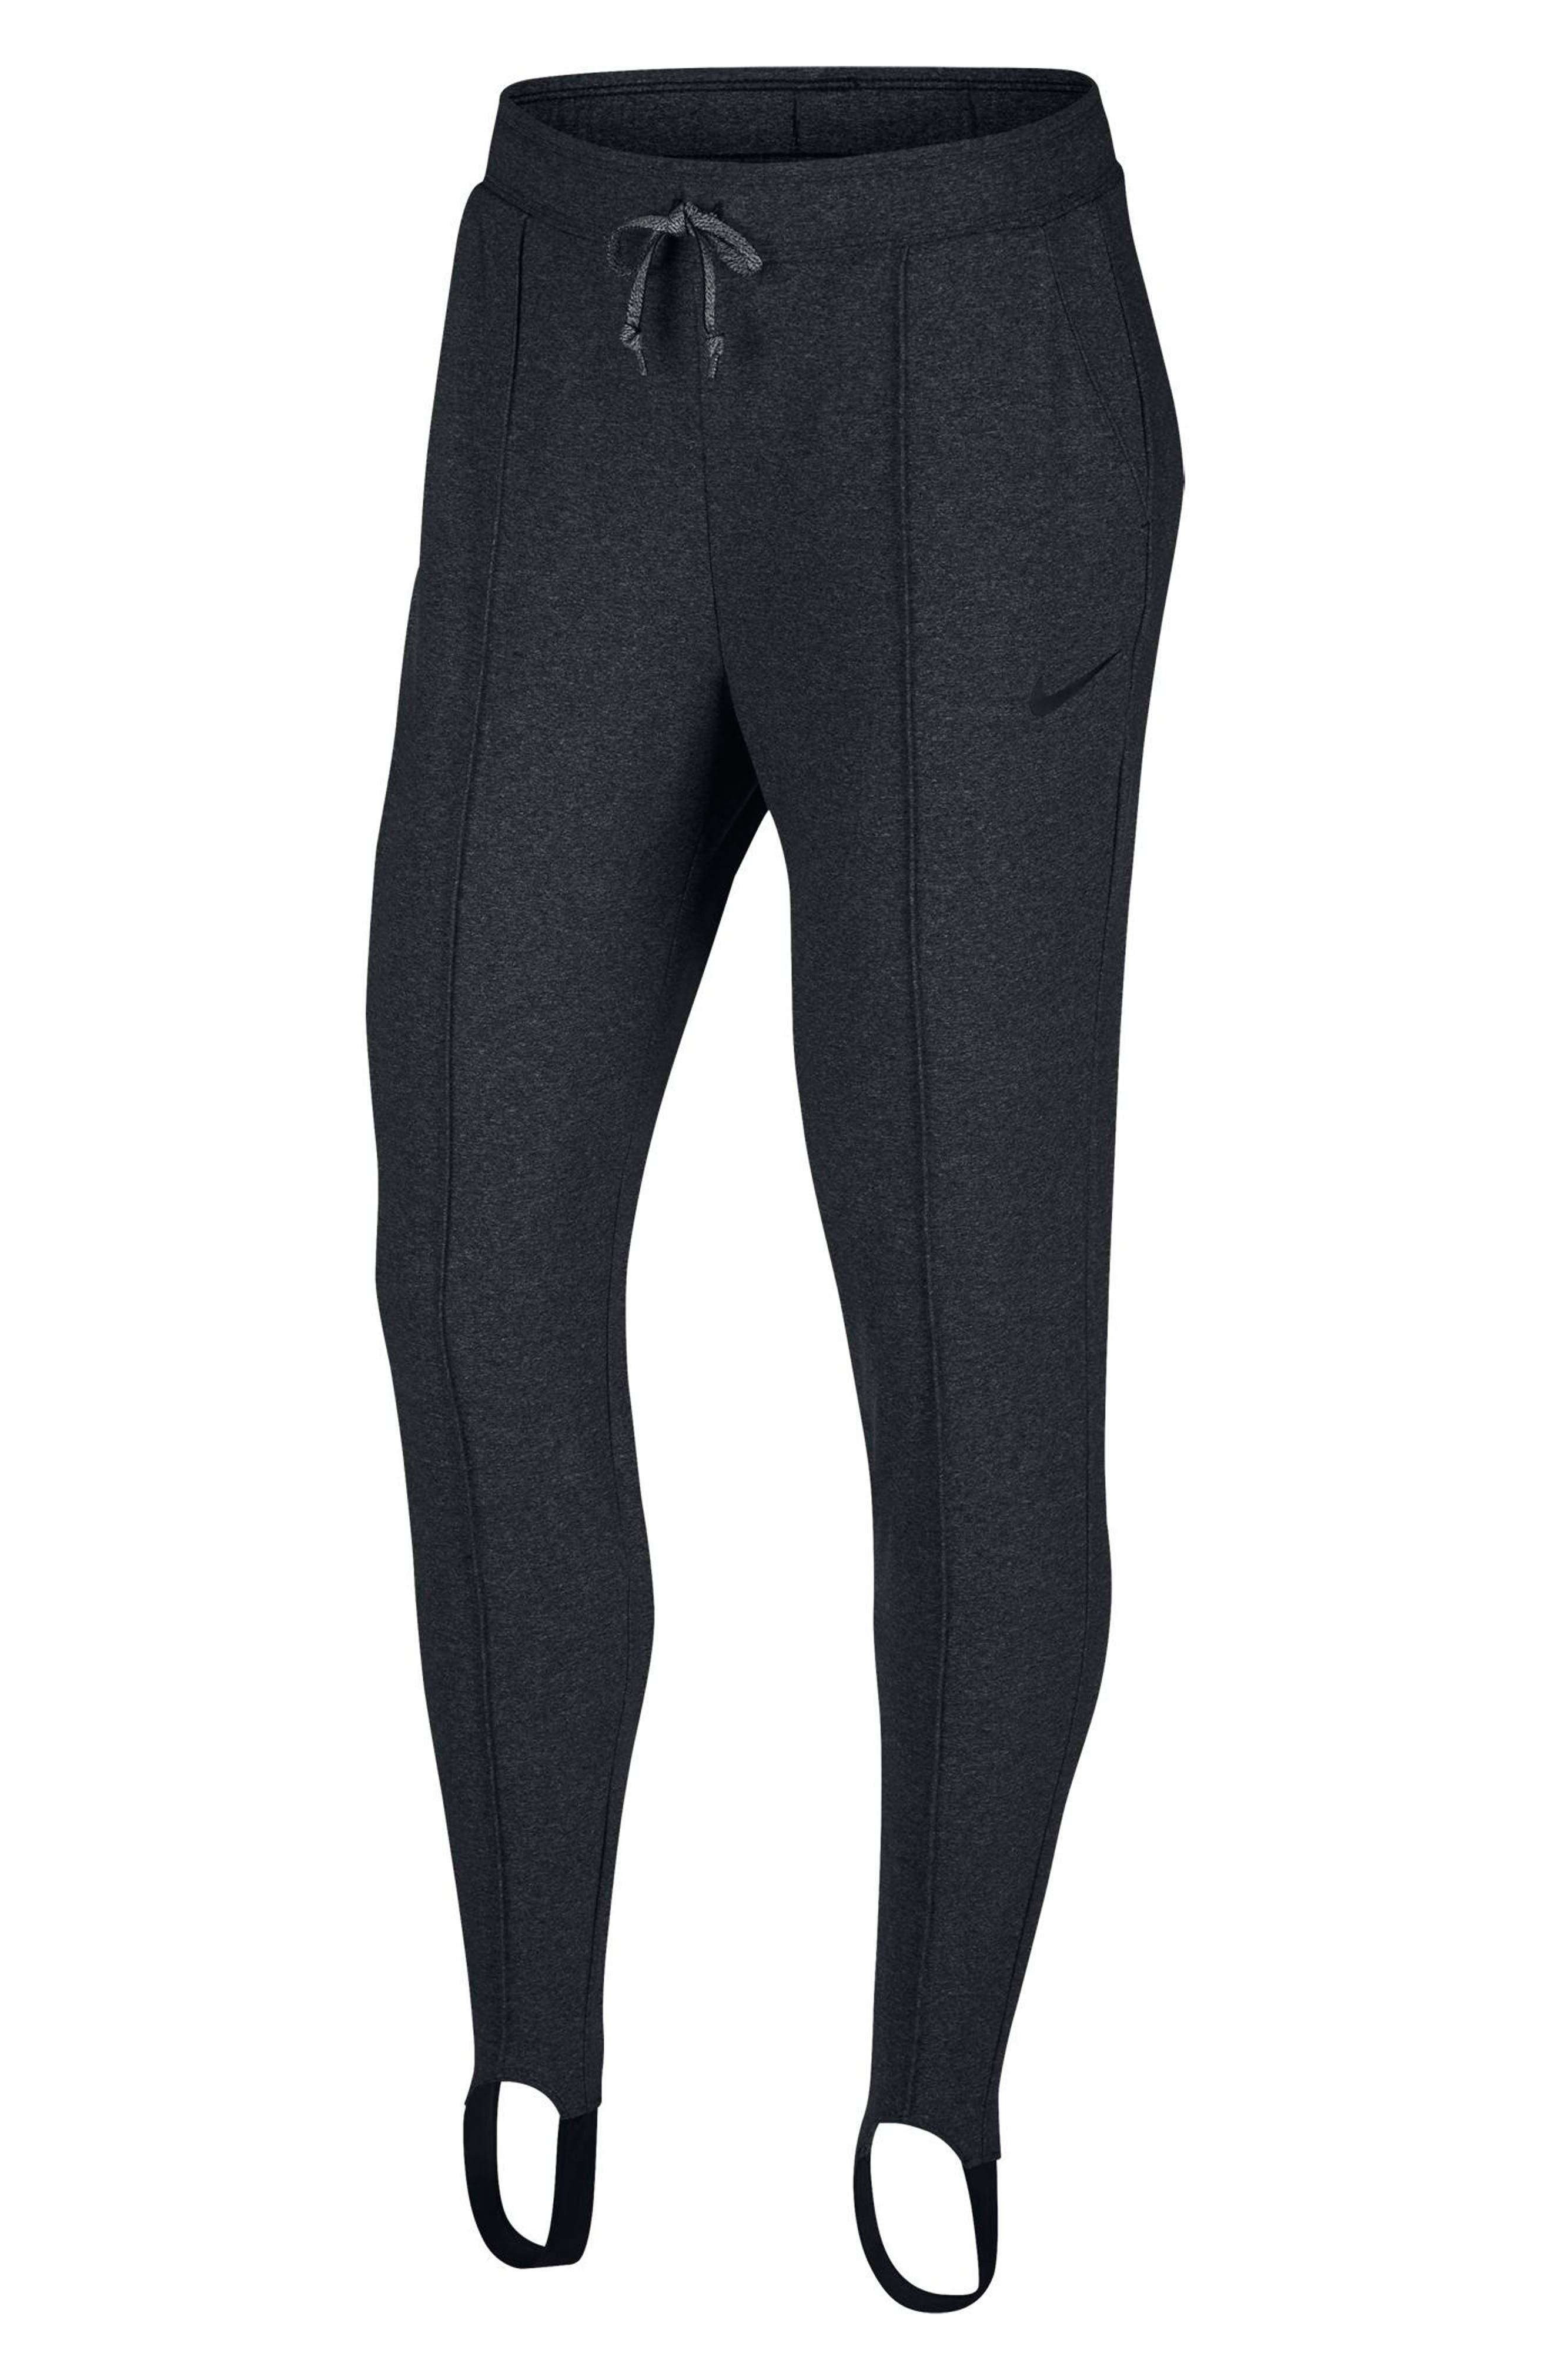 Dry Training Pants,                             Main thumbnail 2, color,